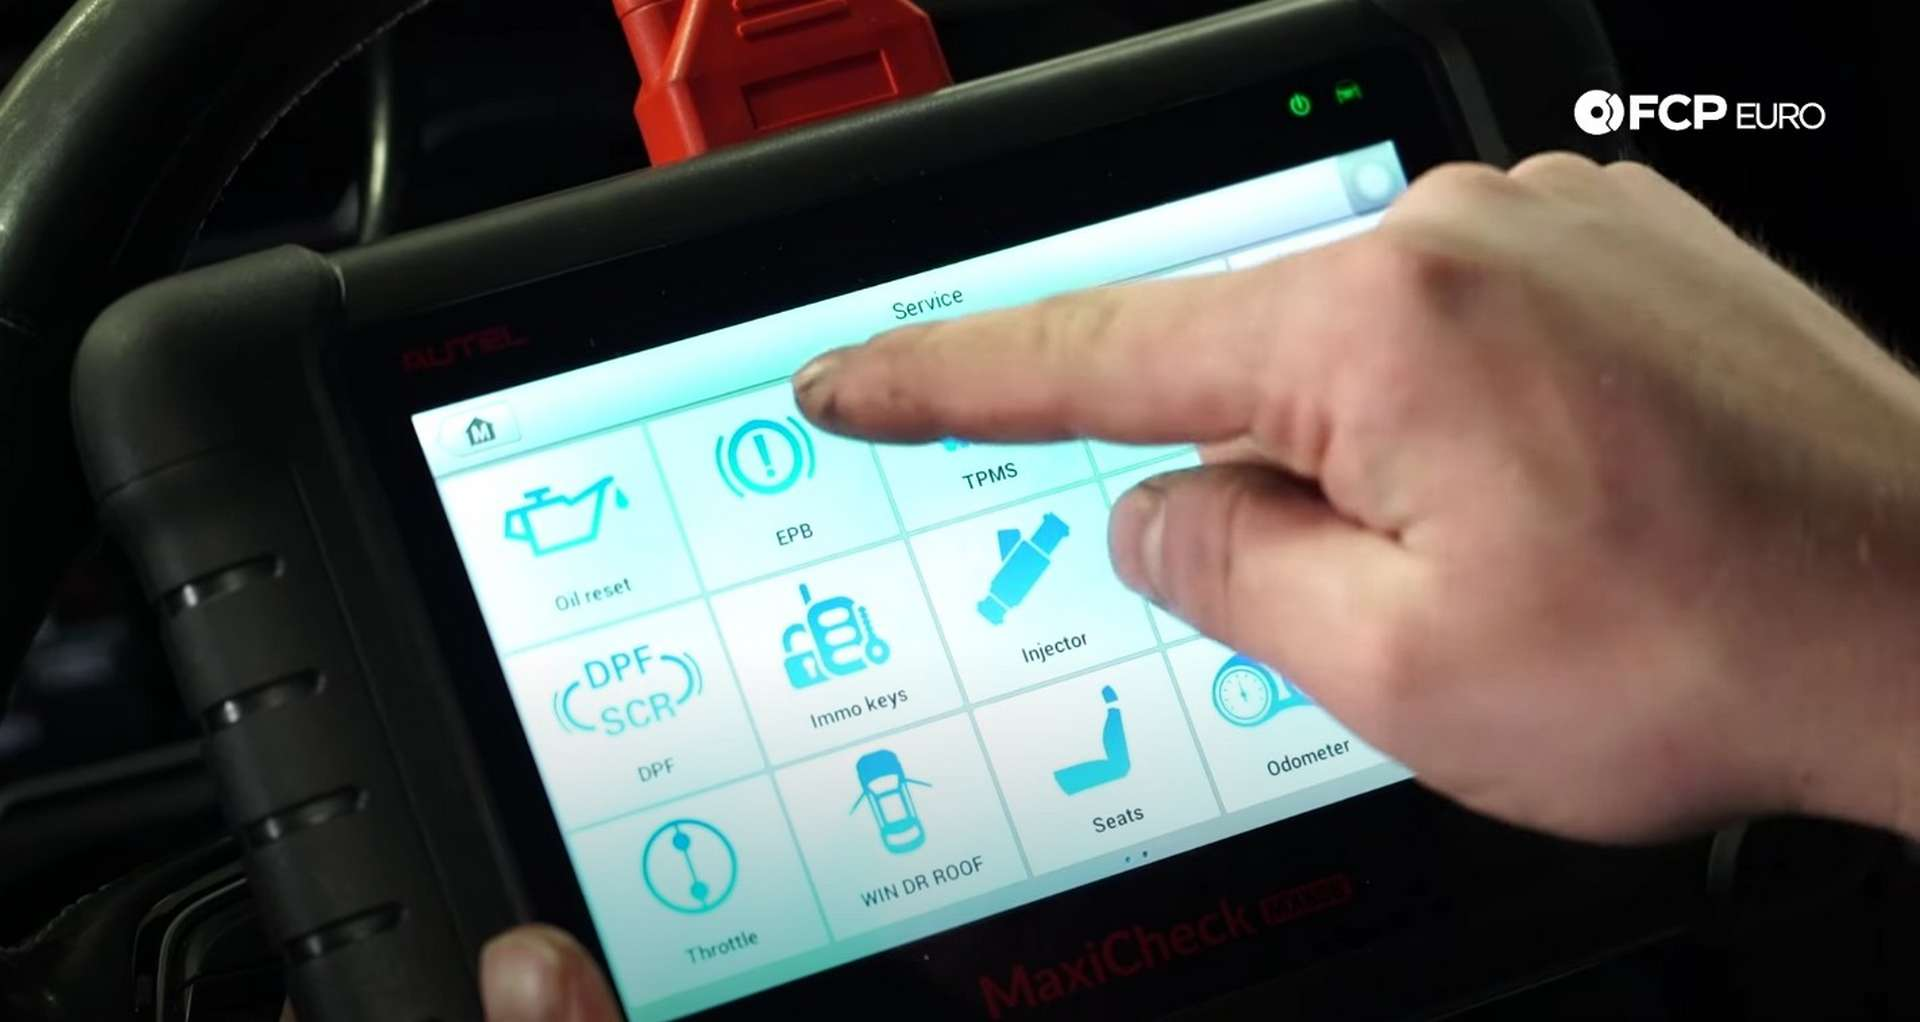 DIY Audi B8 S4 Rear Brake Service selecting EPB on the scan tool